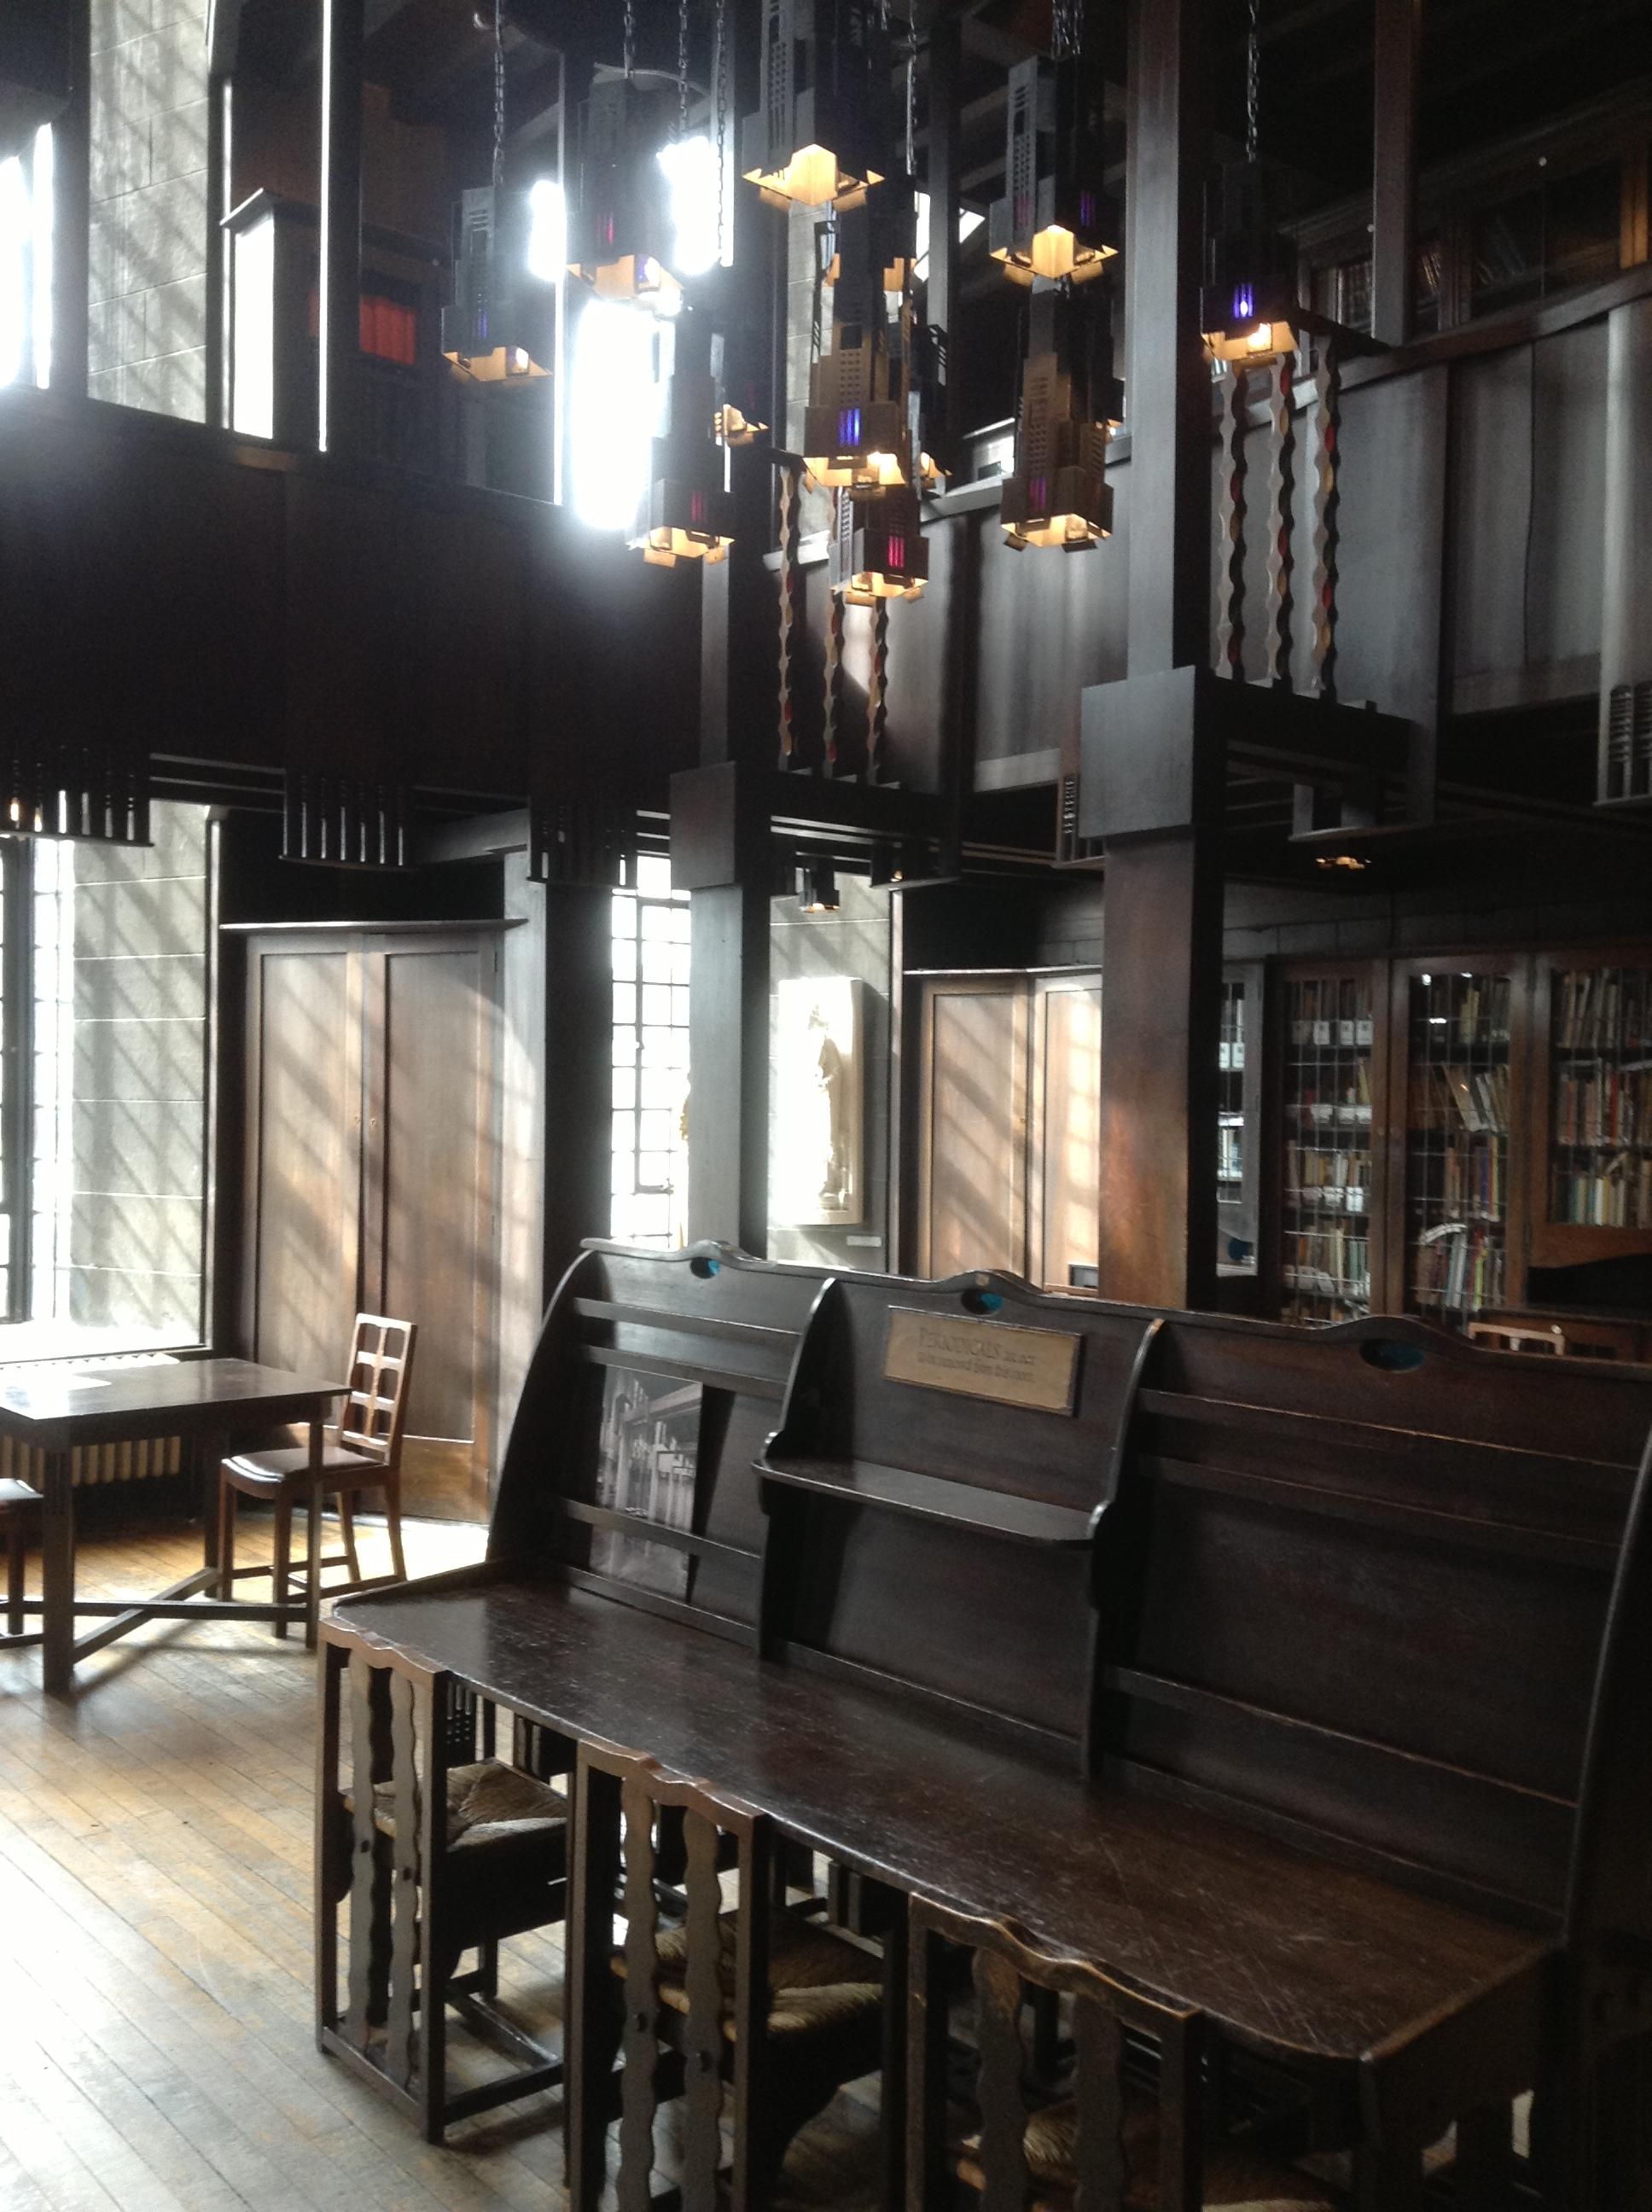 Charles Rennie Mackintosh And The Glasgow School Of Art